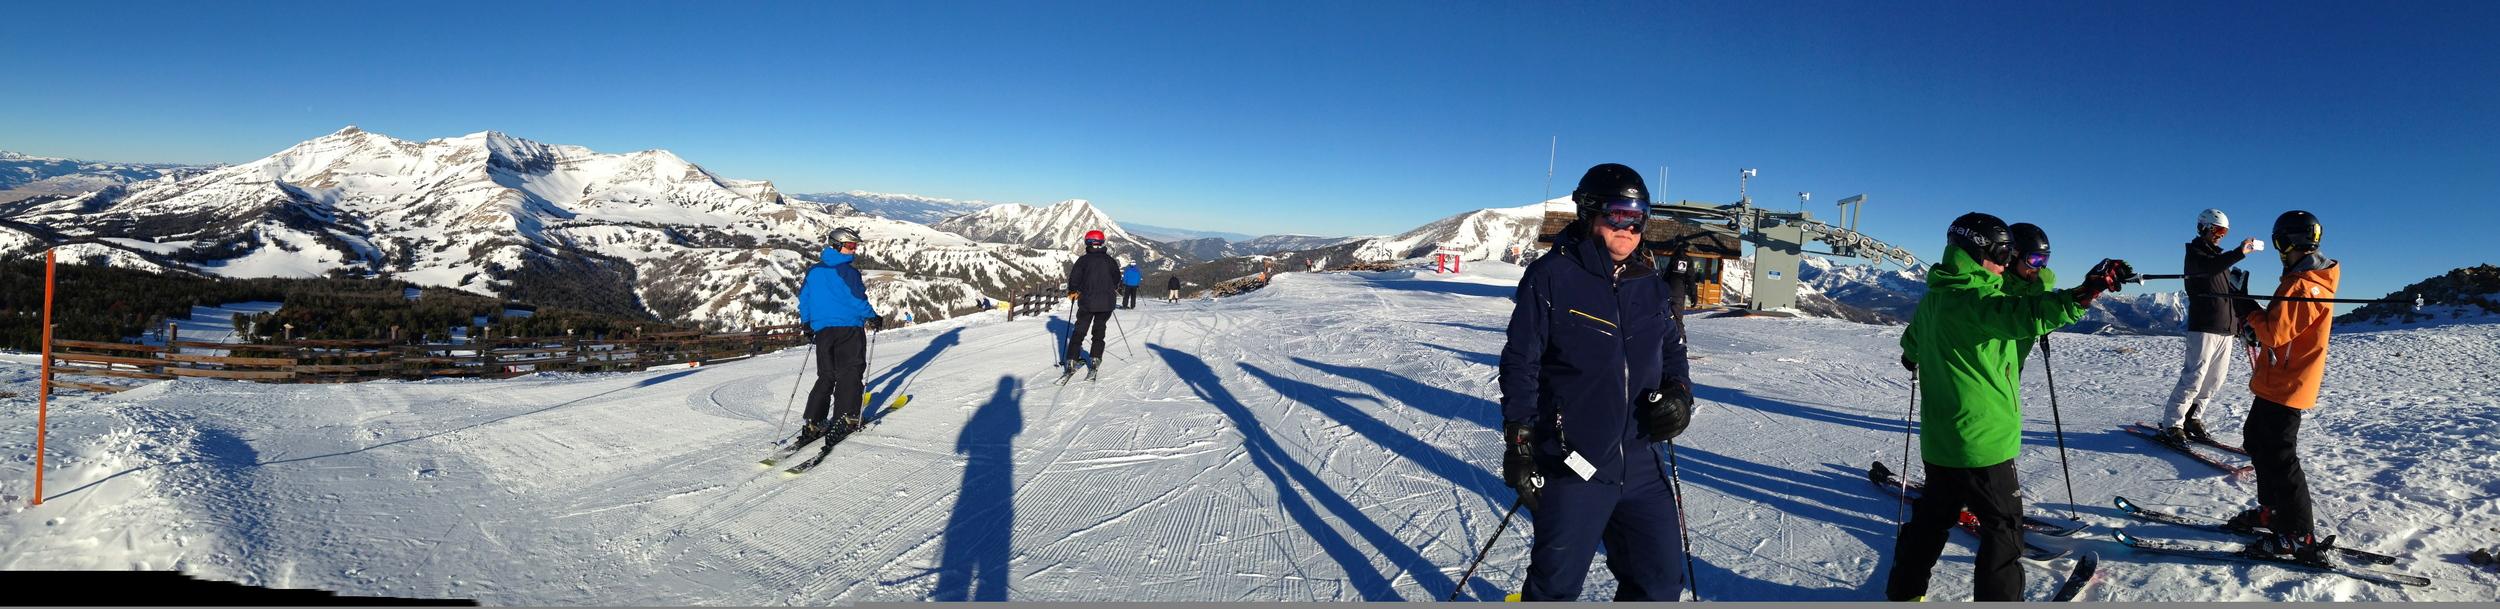 Ski Offsite: Nothing like sliding down a steep mountain to build camaraderie...